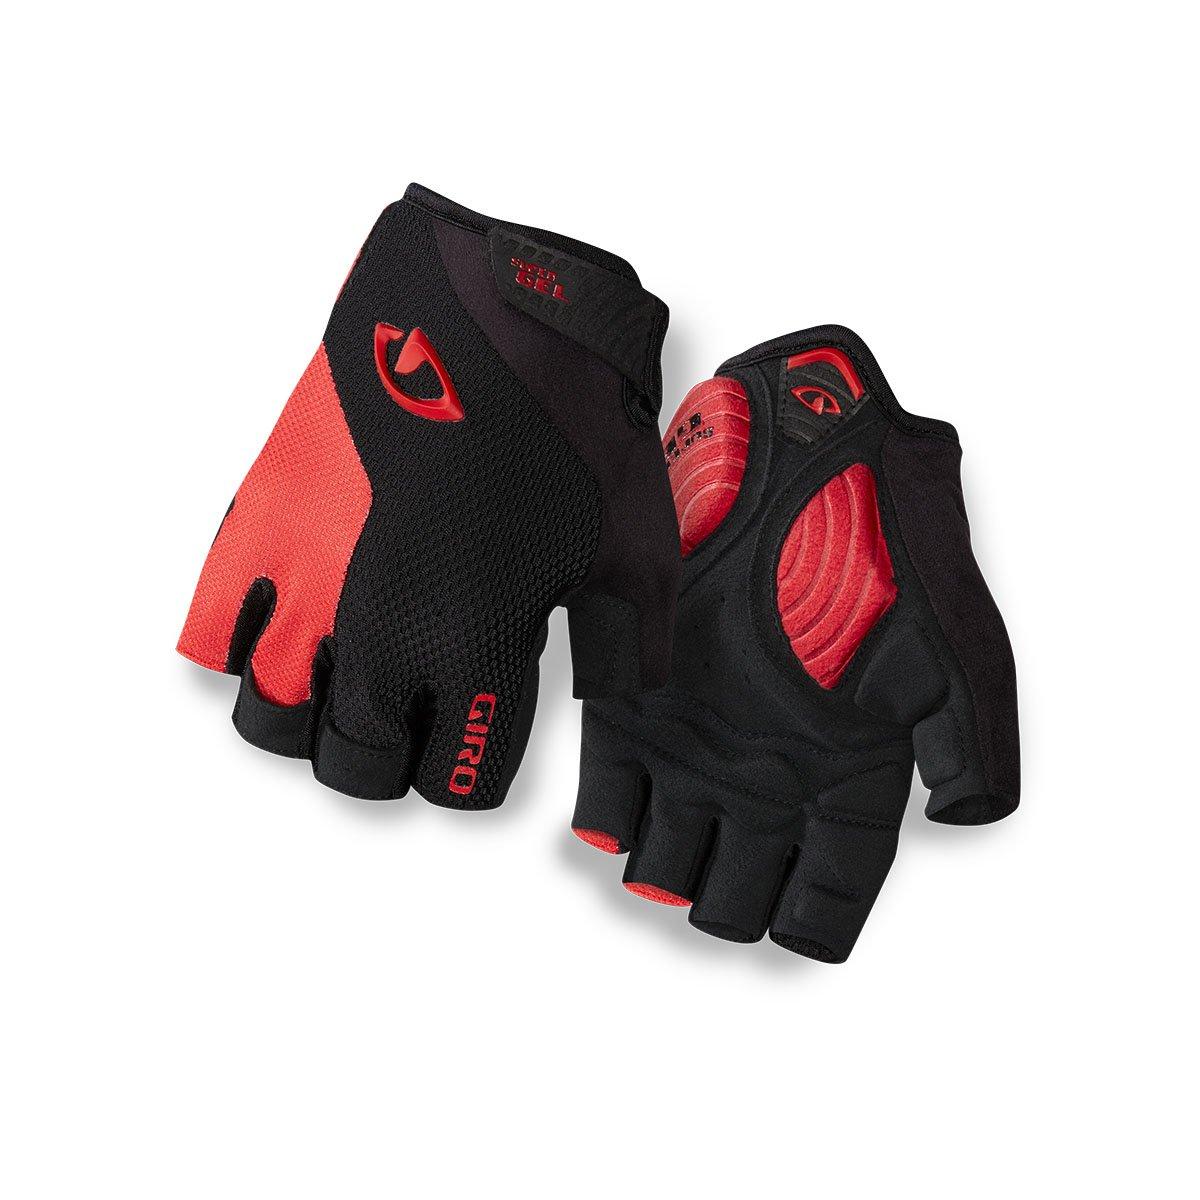 Giro Mens Strate Dure Supergel Gloves